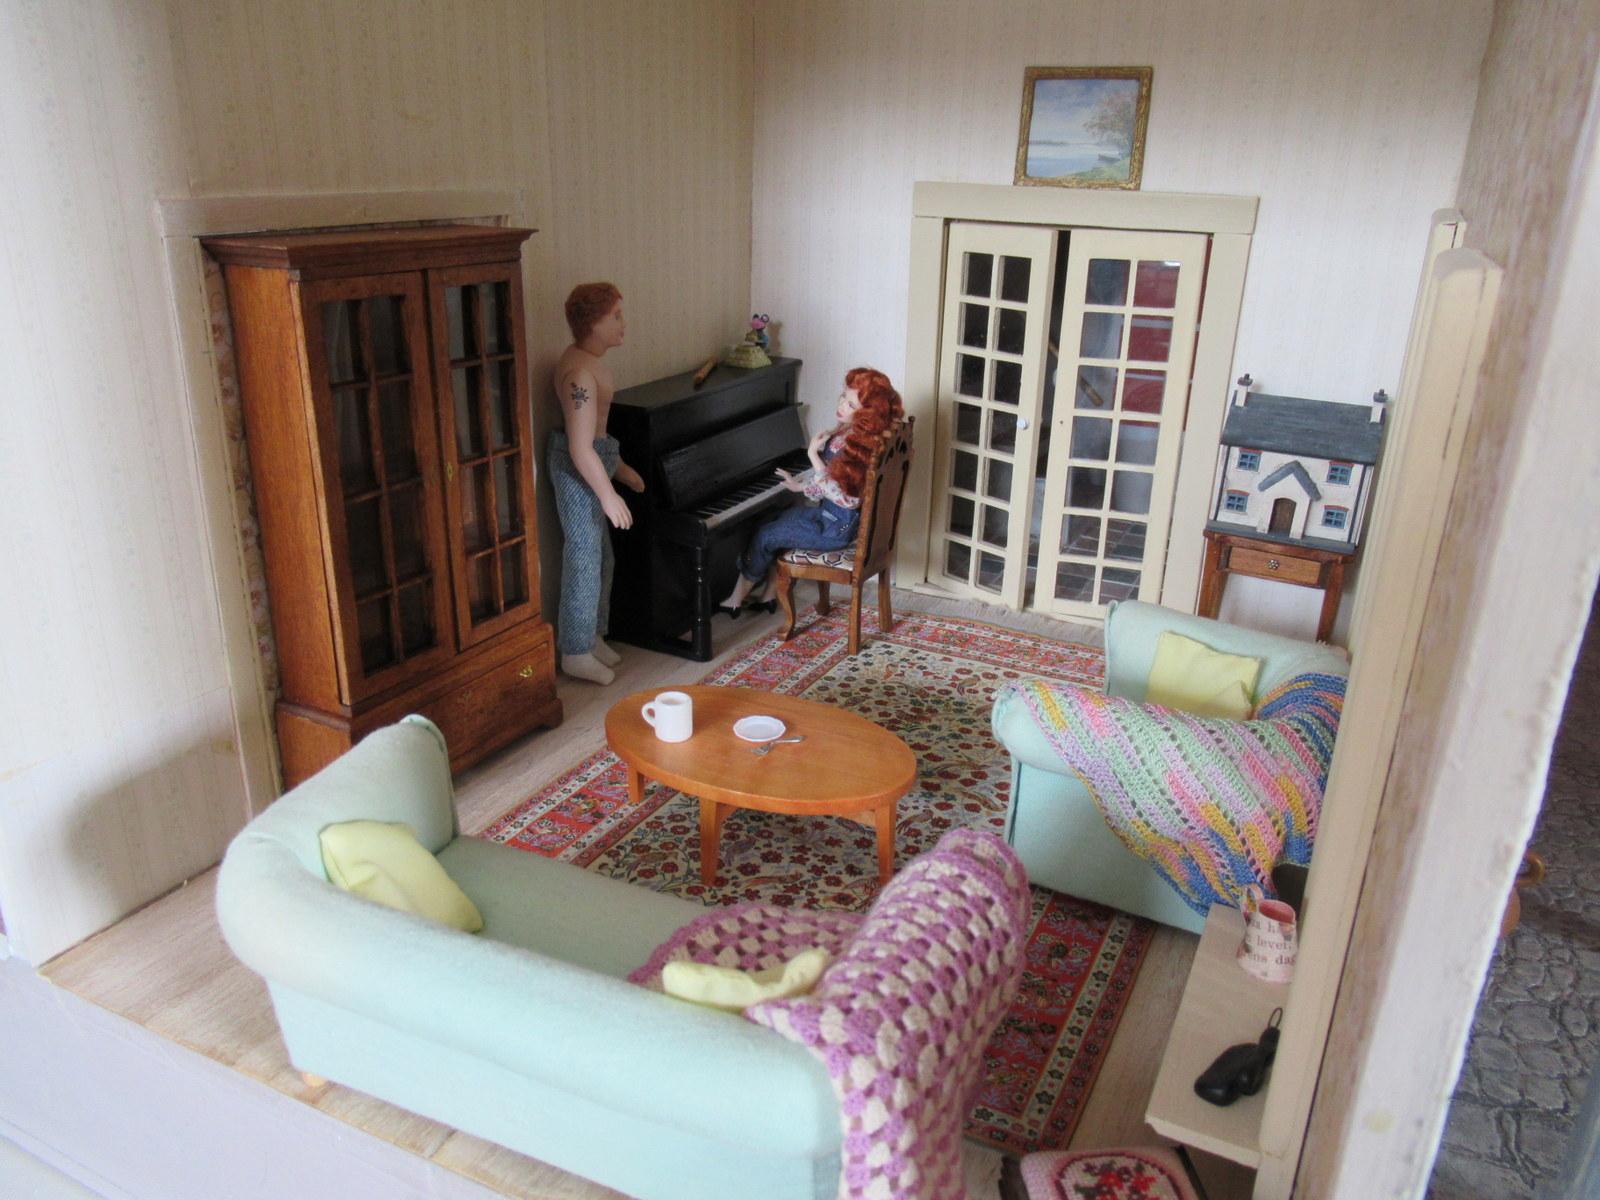 Margriet 39 s miniatures m huis meubels woonkamer furniture living room - Woonkamer meubels ...